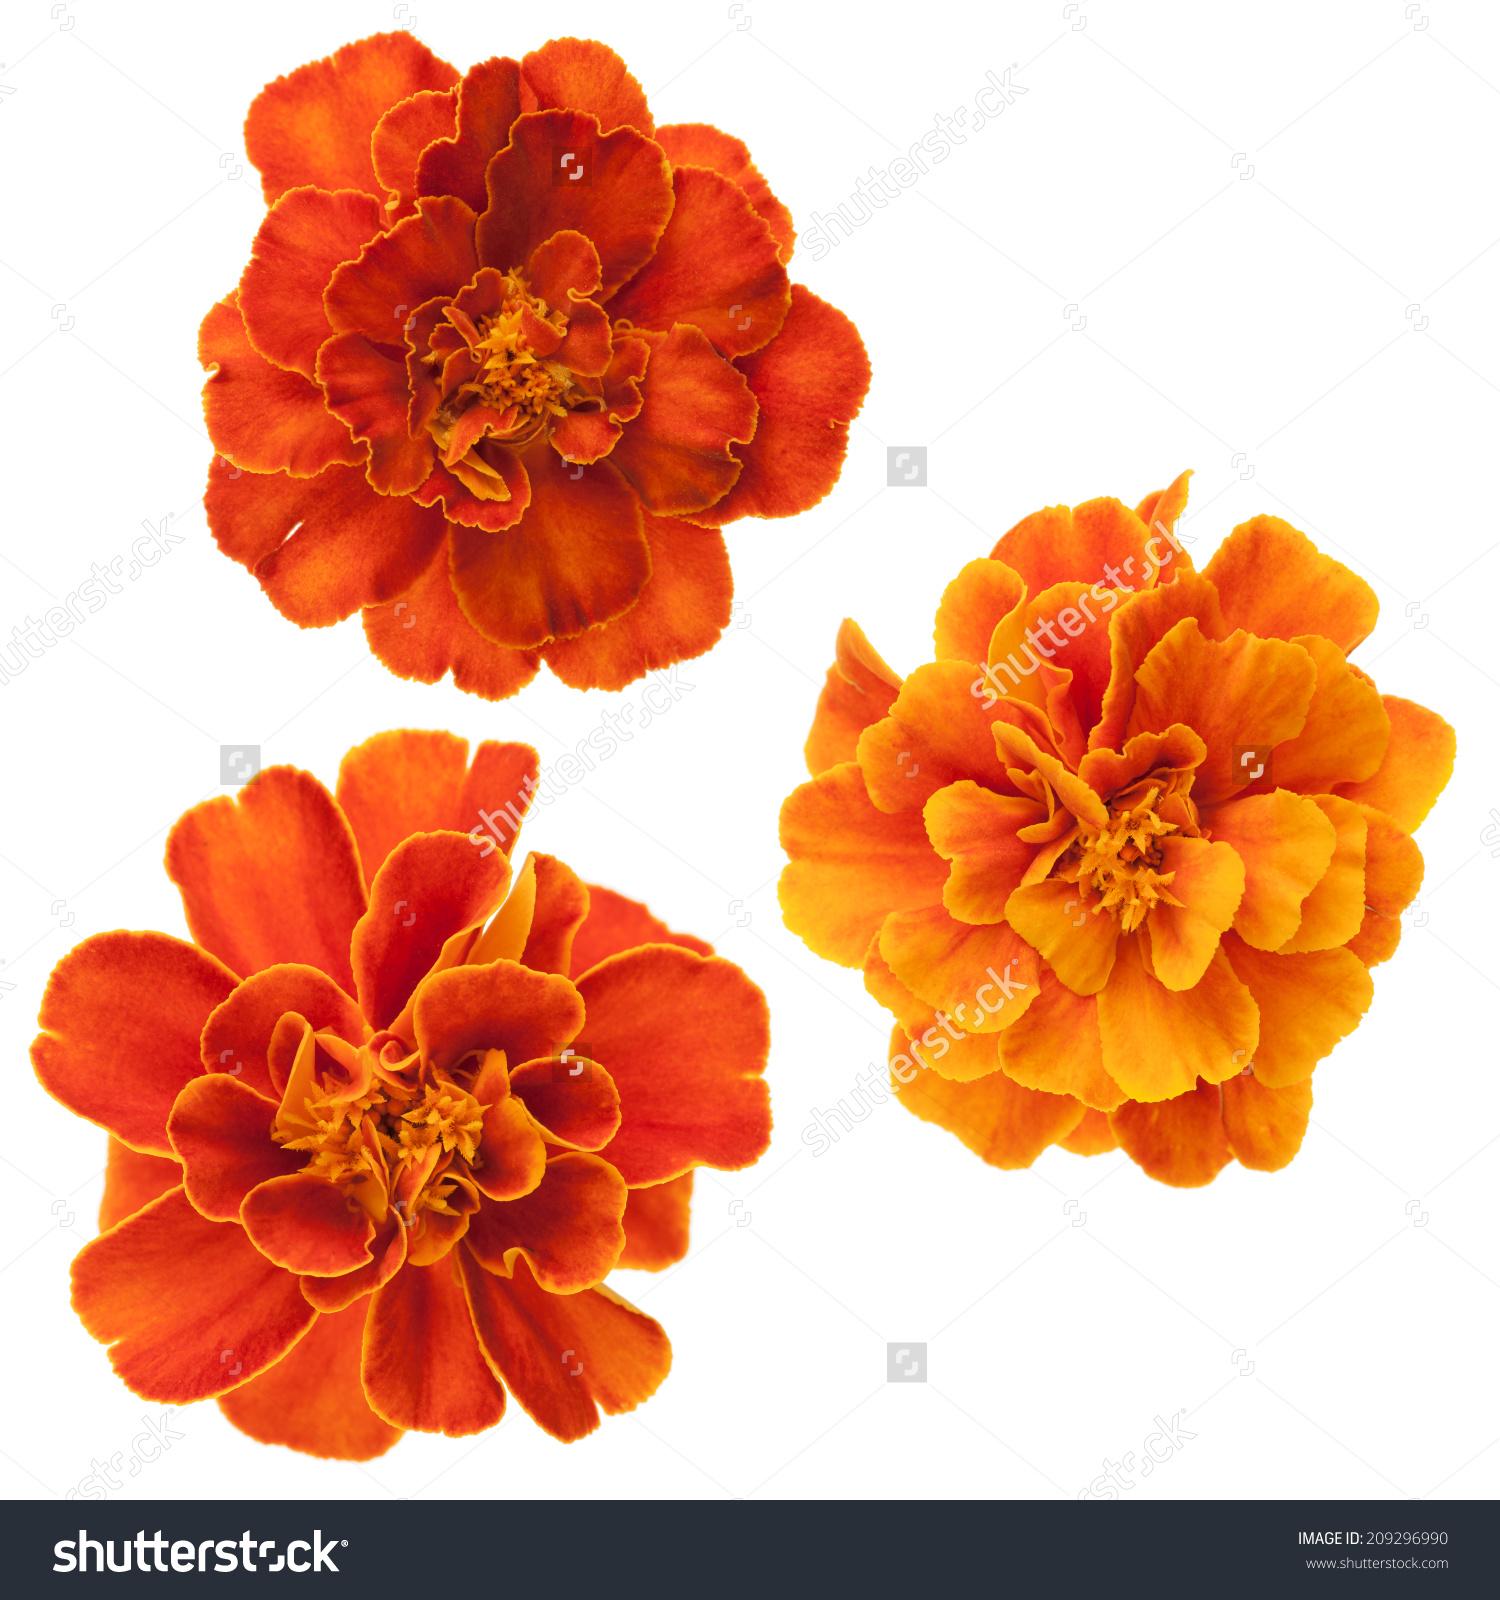 Set Three French Marigolds Tagetes Patula Stock Photo 209296990.